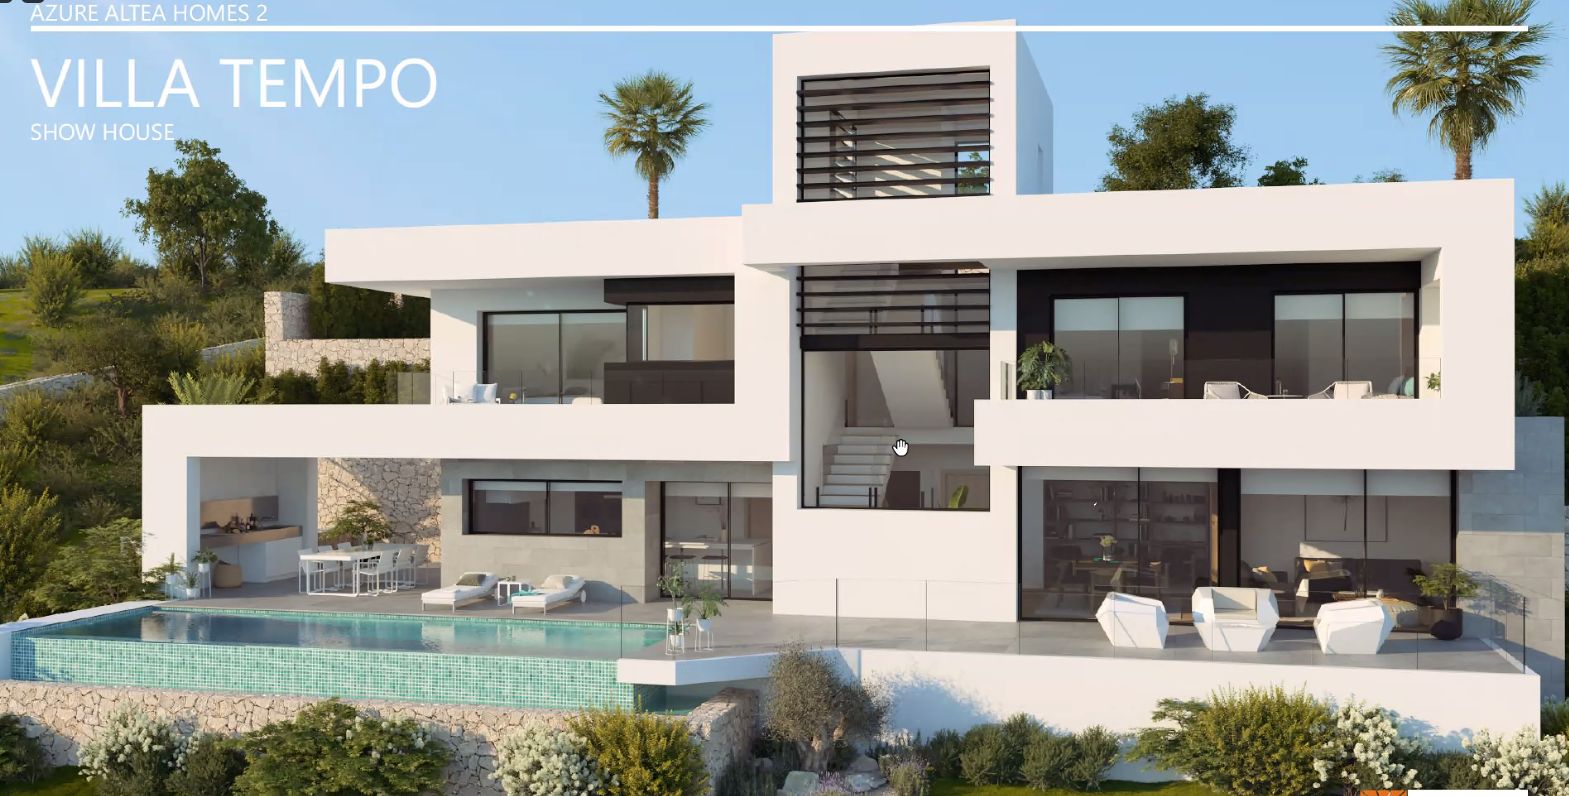 Azure_Altea_Homes